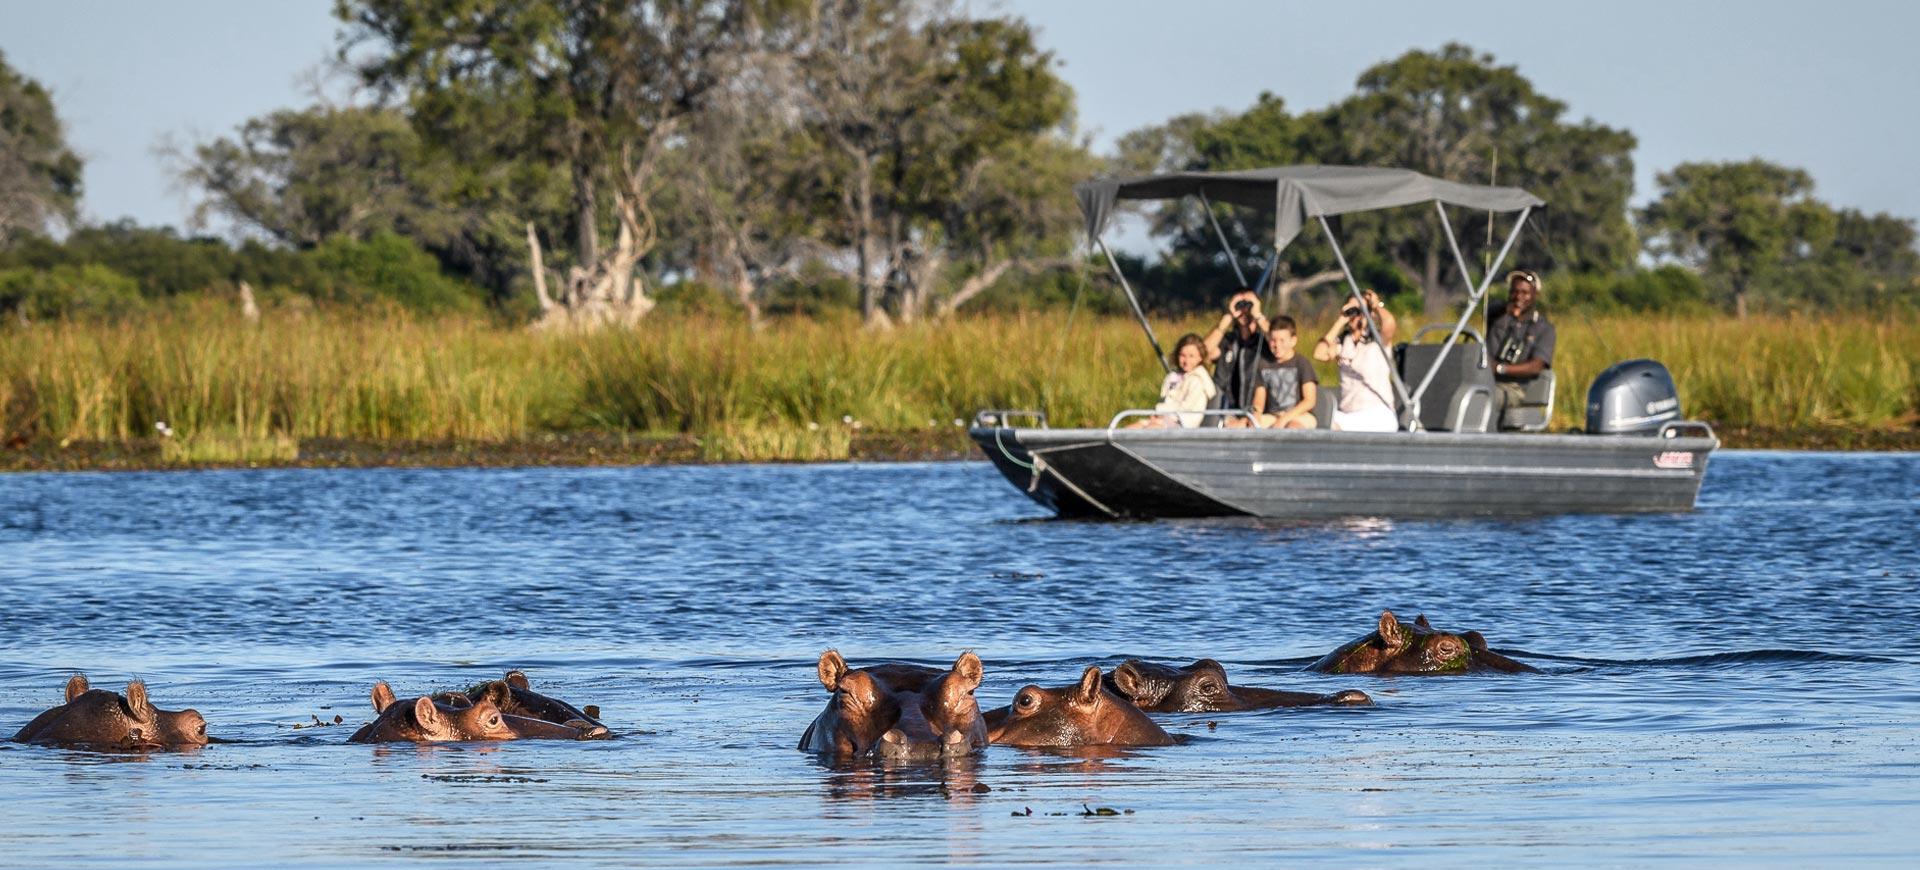 Okavango Delta River Cruises